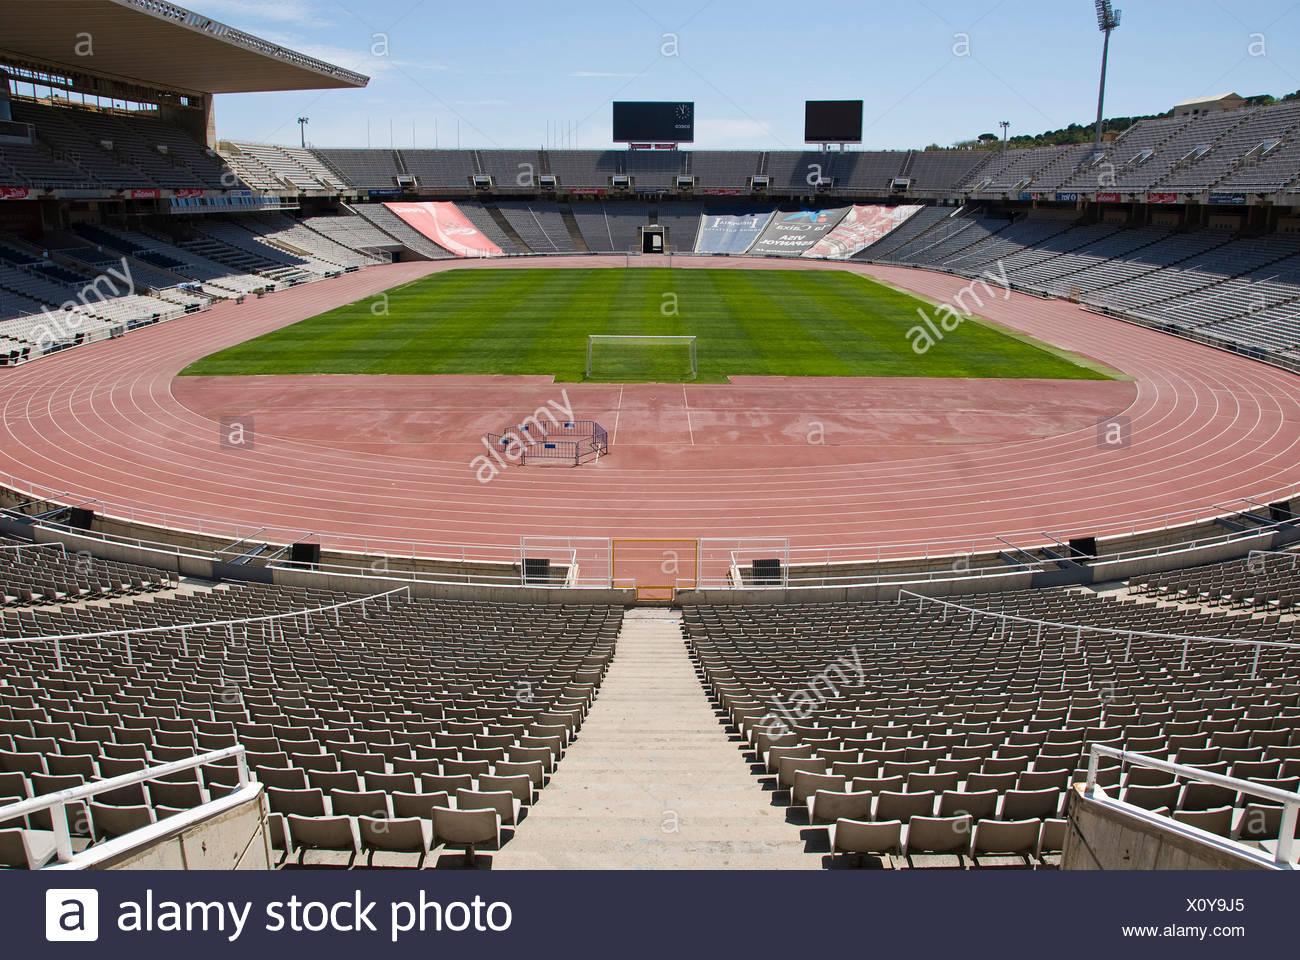 Olympic Stadium Estadi Olímpic Lluís Companys, formerly known as the Estadi Olímpic de Montjuïc, on Montjuïc hill, Barcelona, S - Stock Image